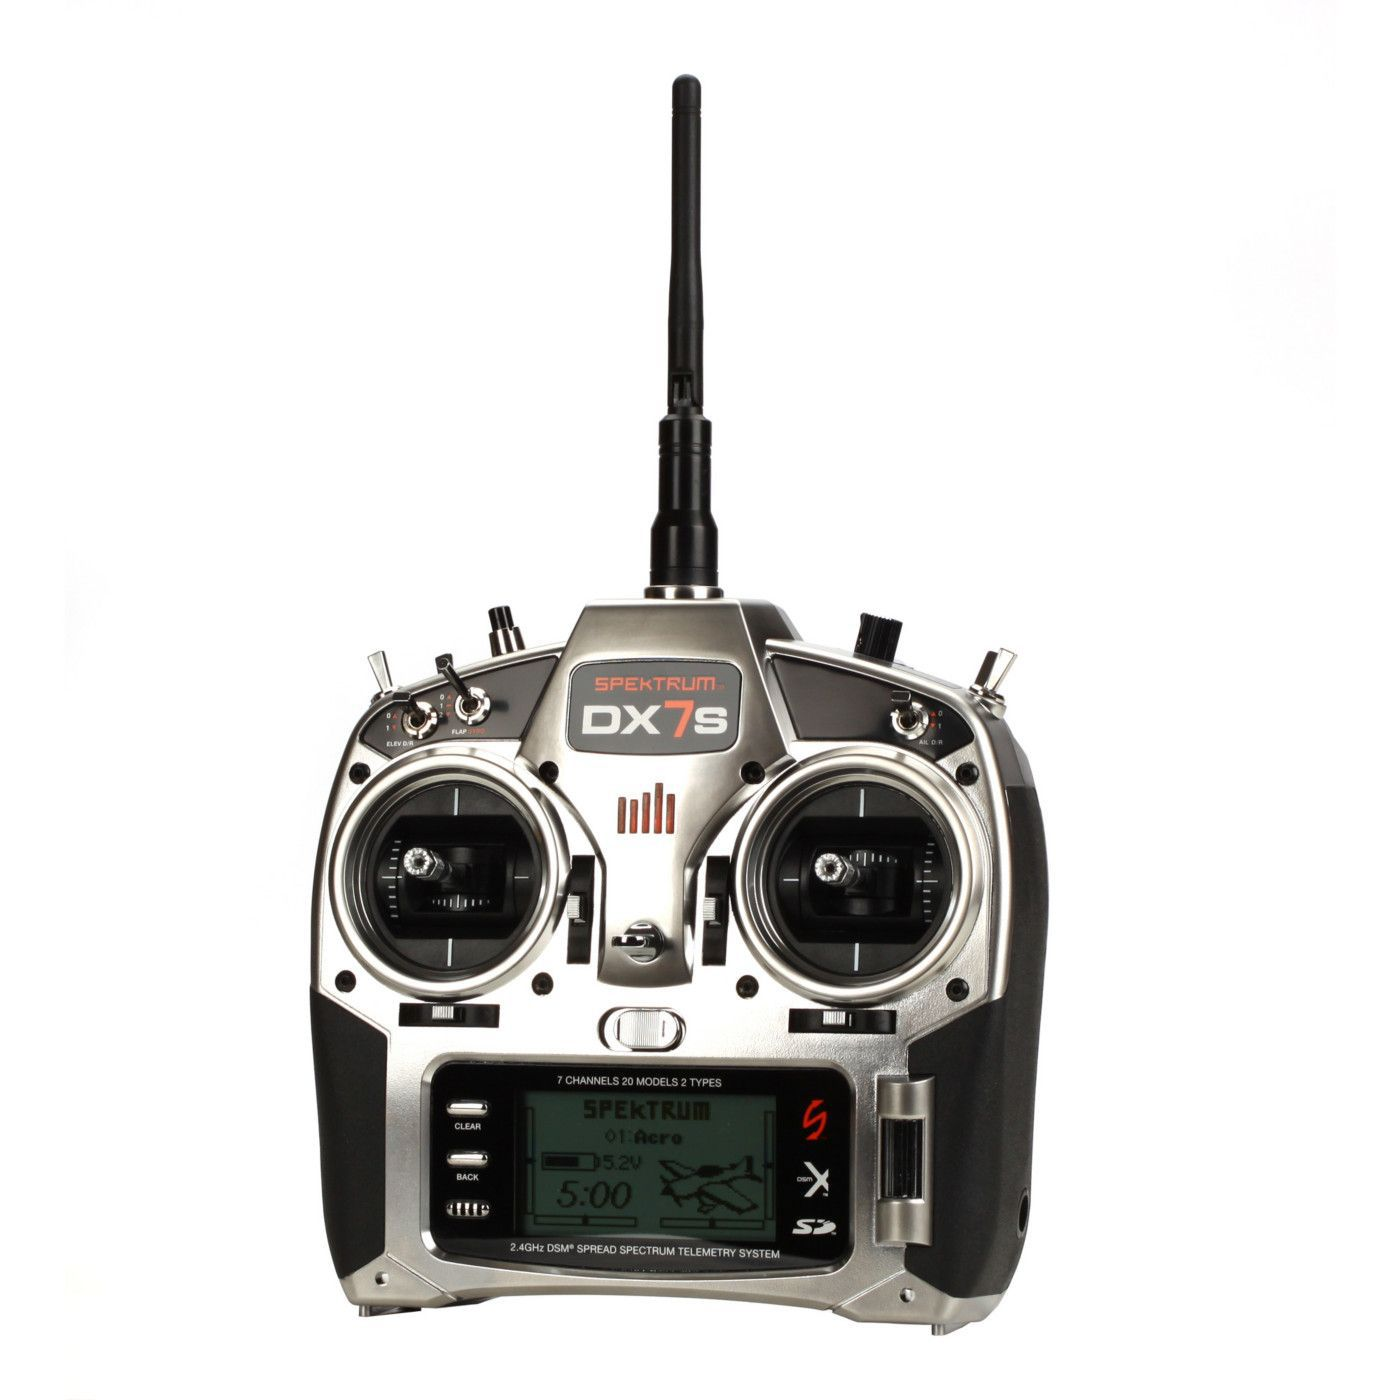 SPM7800_a0?wid=1400&hei=778 spektrum dx7 7 channel dsmx programmable rc radio transmitter with spektrum ar8000 wiring diagram at soozxer.org